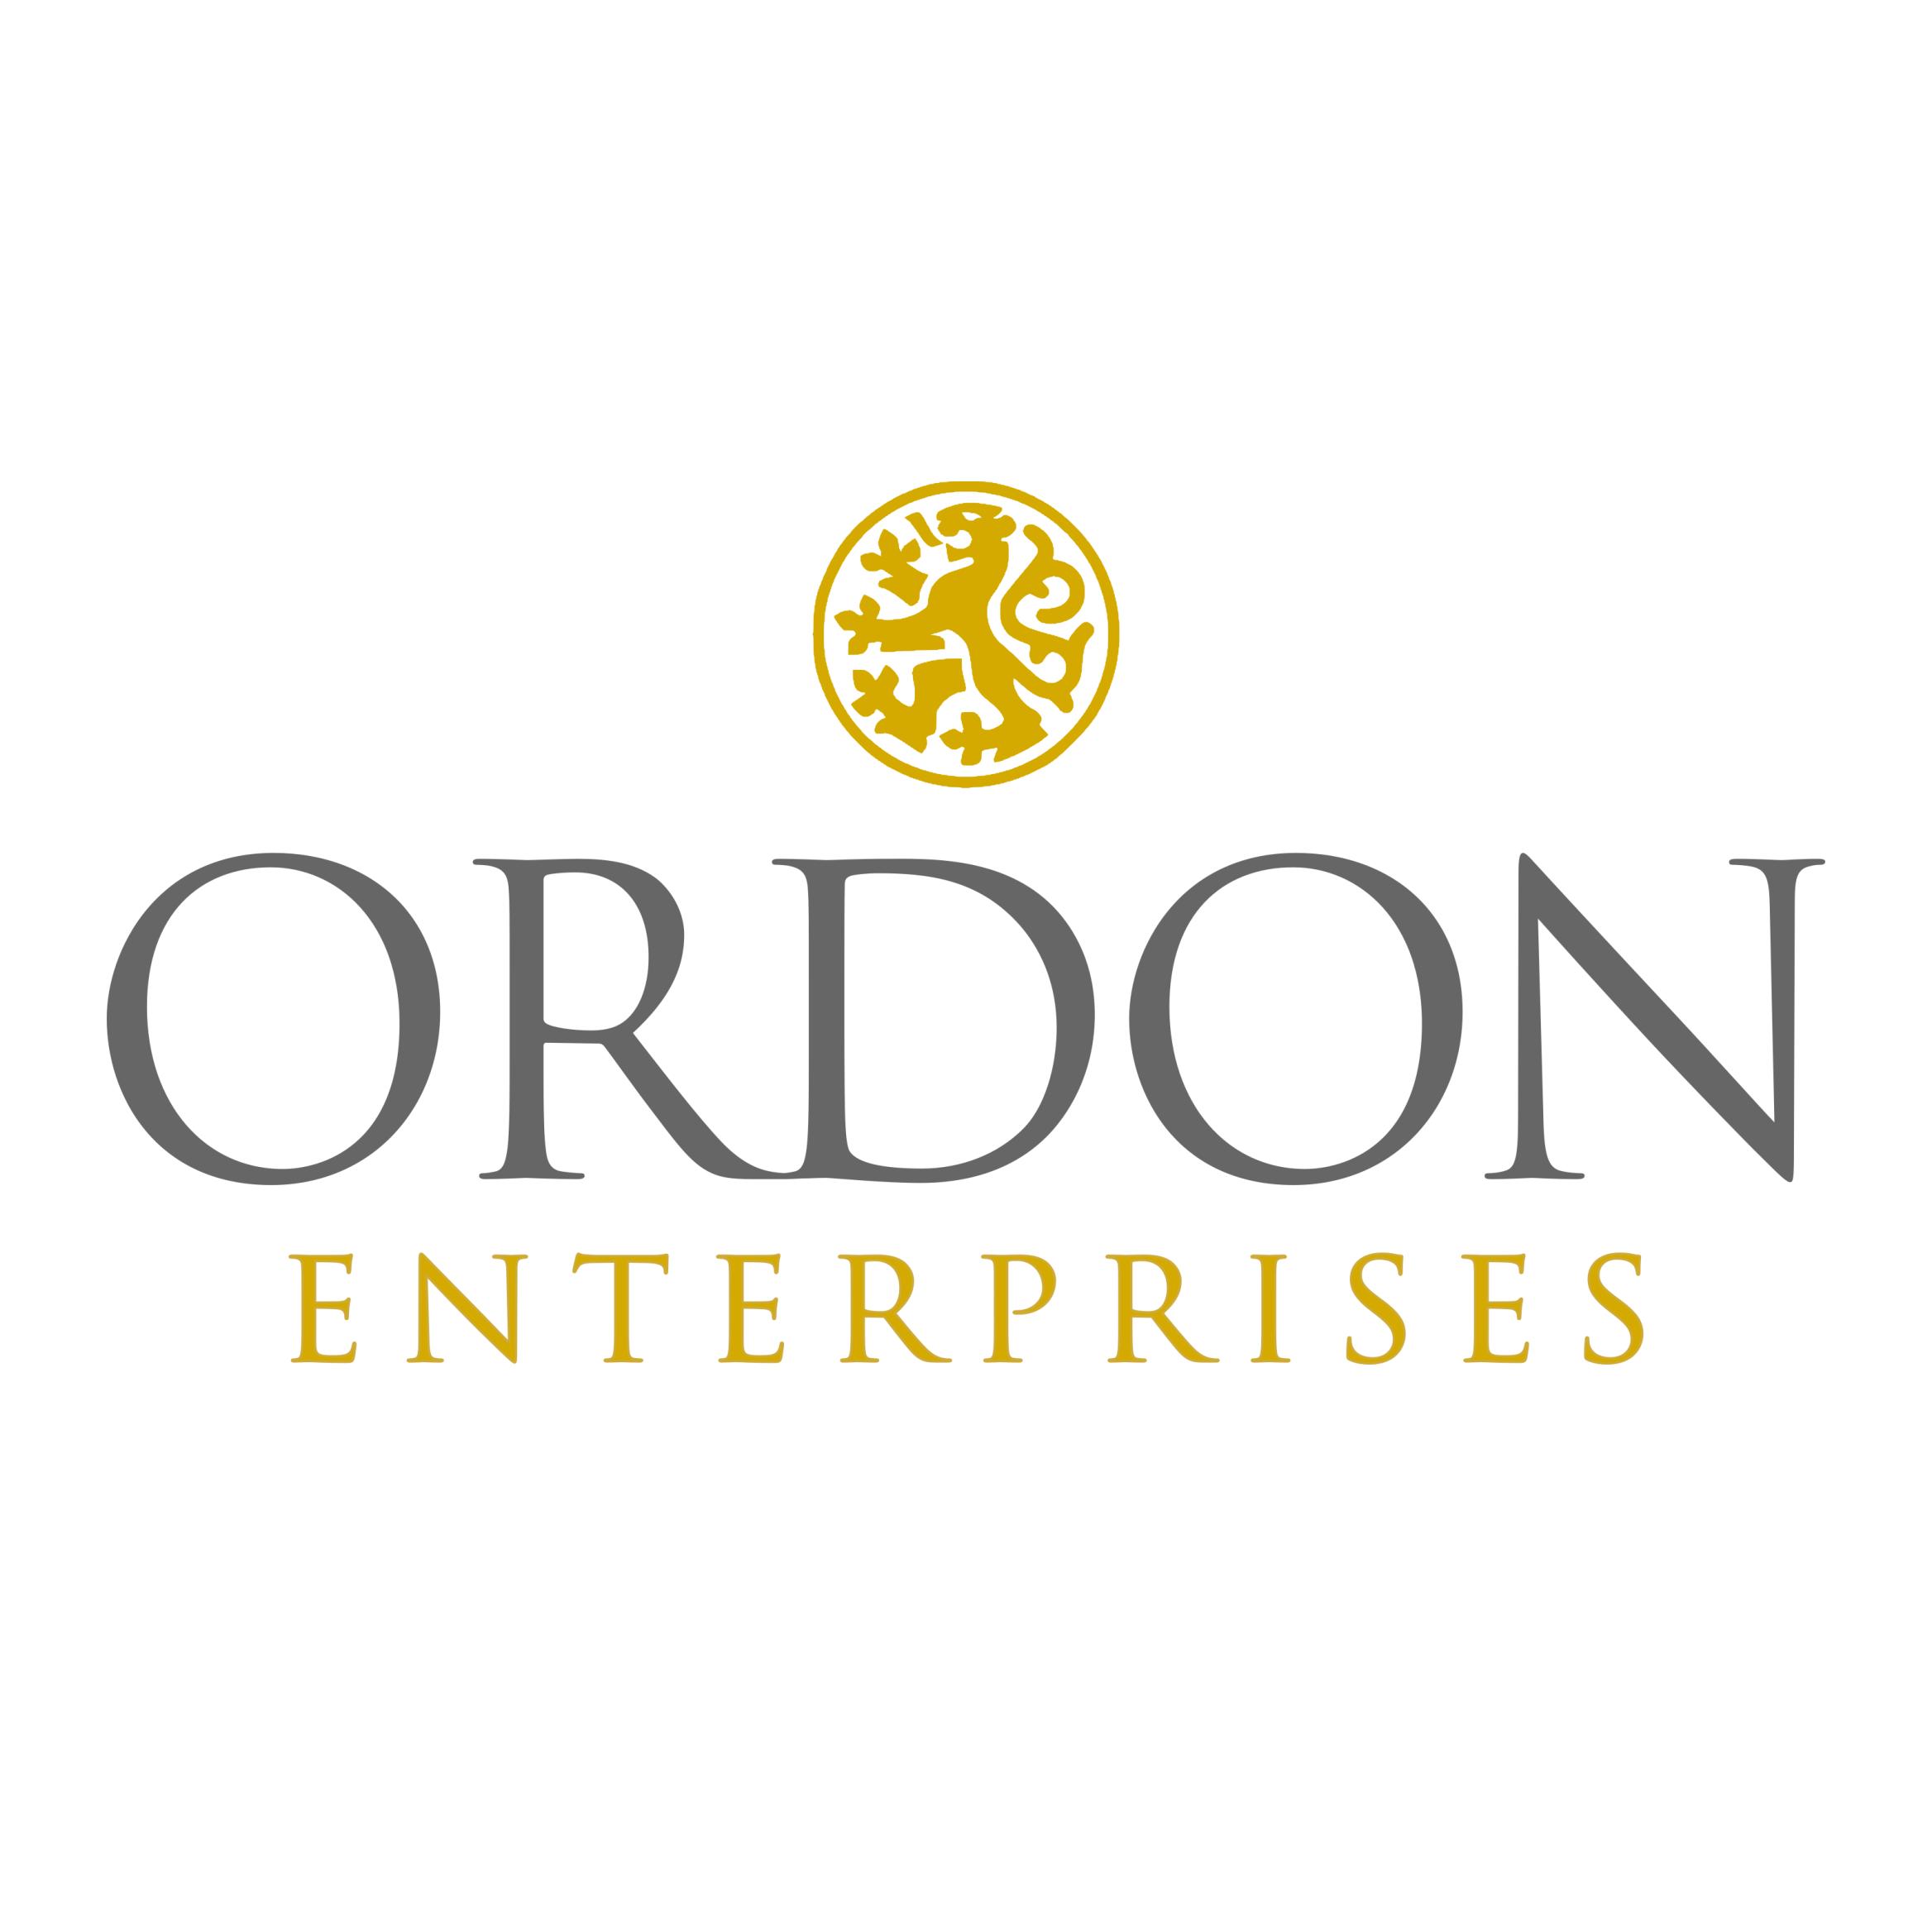 Ordon Enterprises LLC